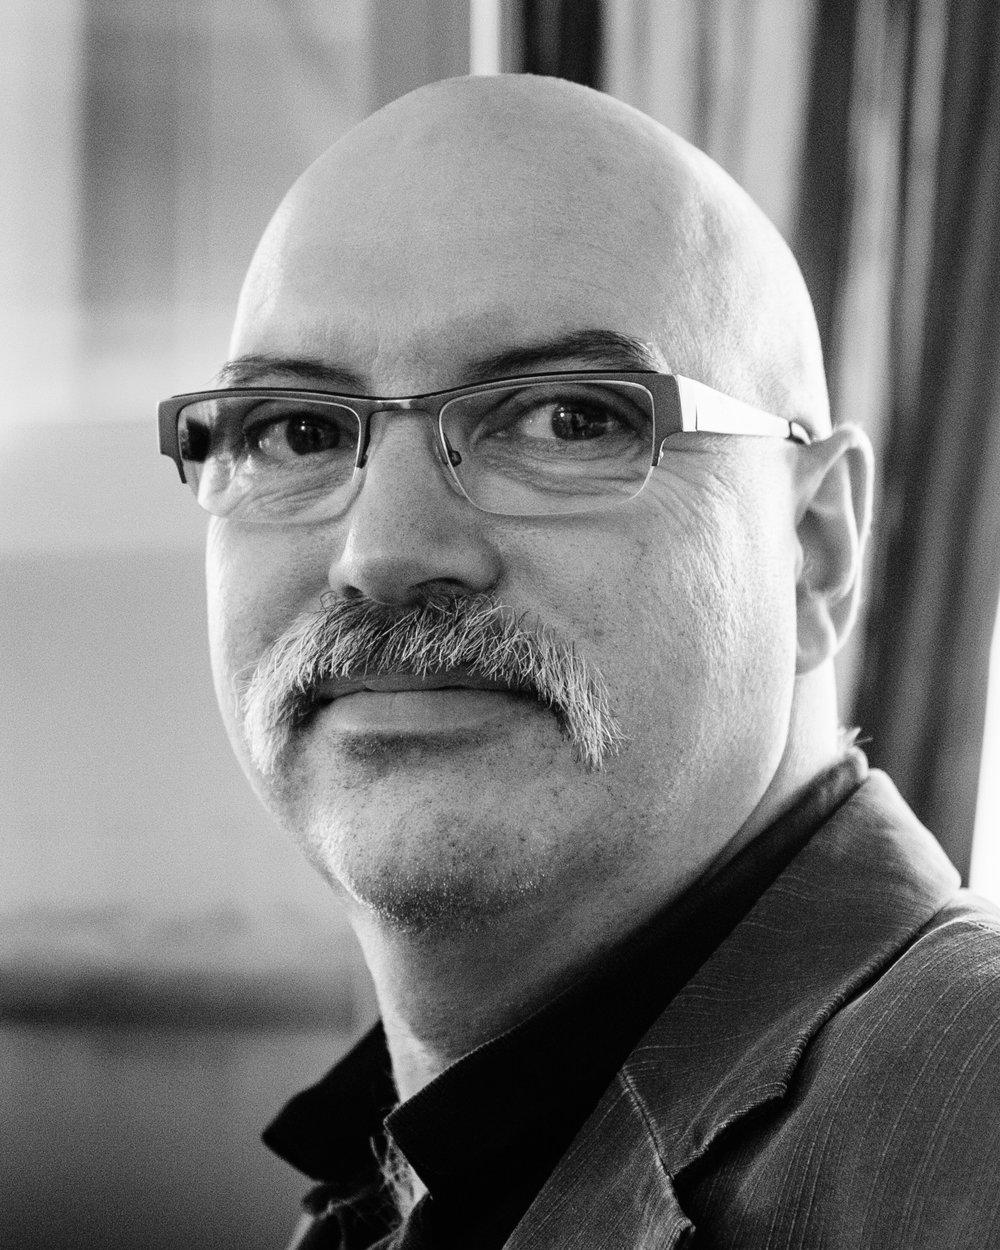 Terje Winther - Daglig leder i De Unges Orkesterforbund (UNOF).Utdannet komponist og dirigent.Har arbeidet mye med praktiske oppgaver i musikklivet